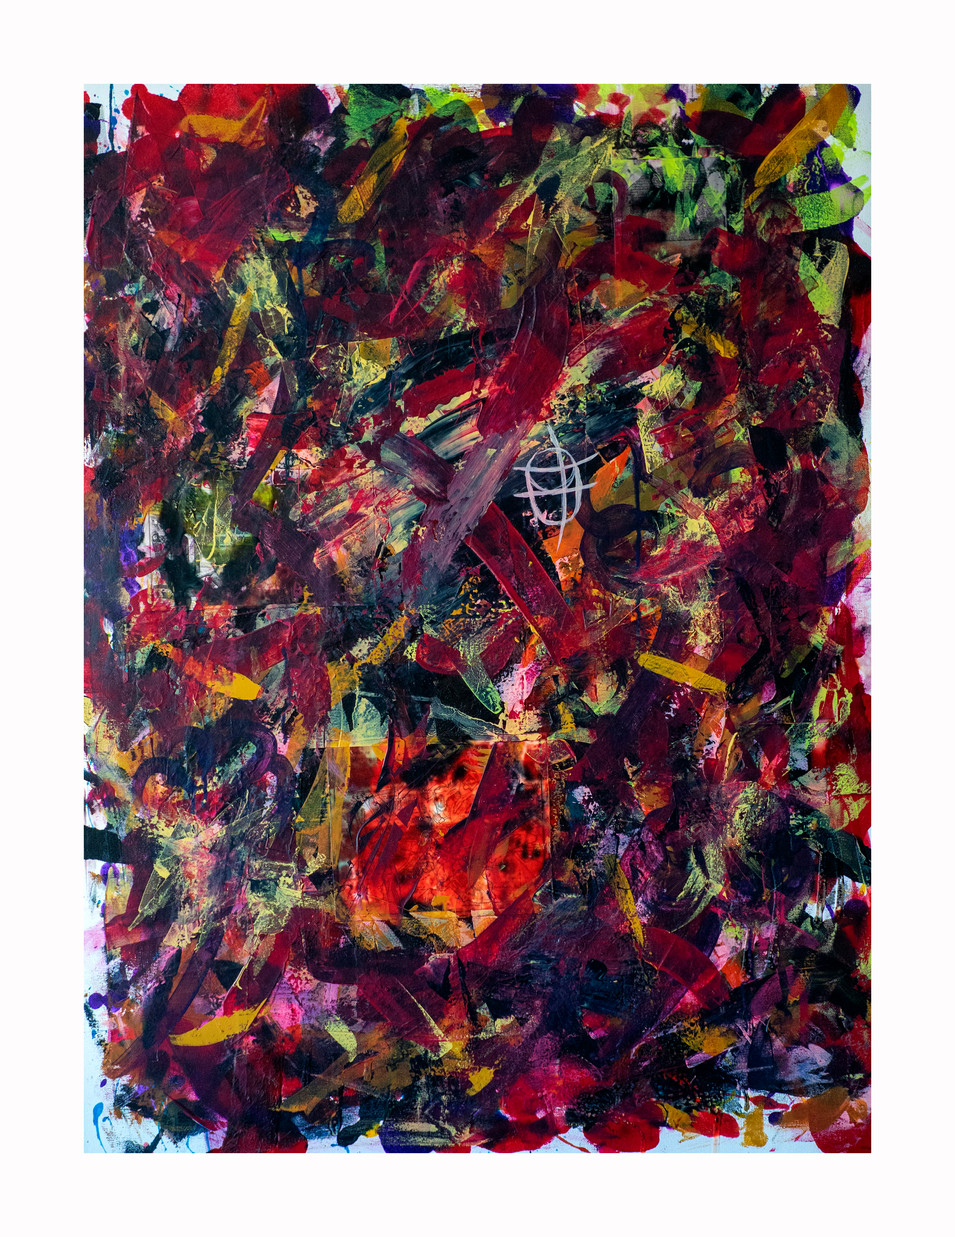 30 x 40 (canvas)